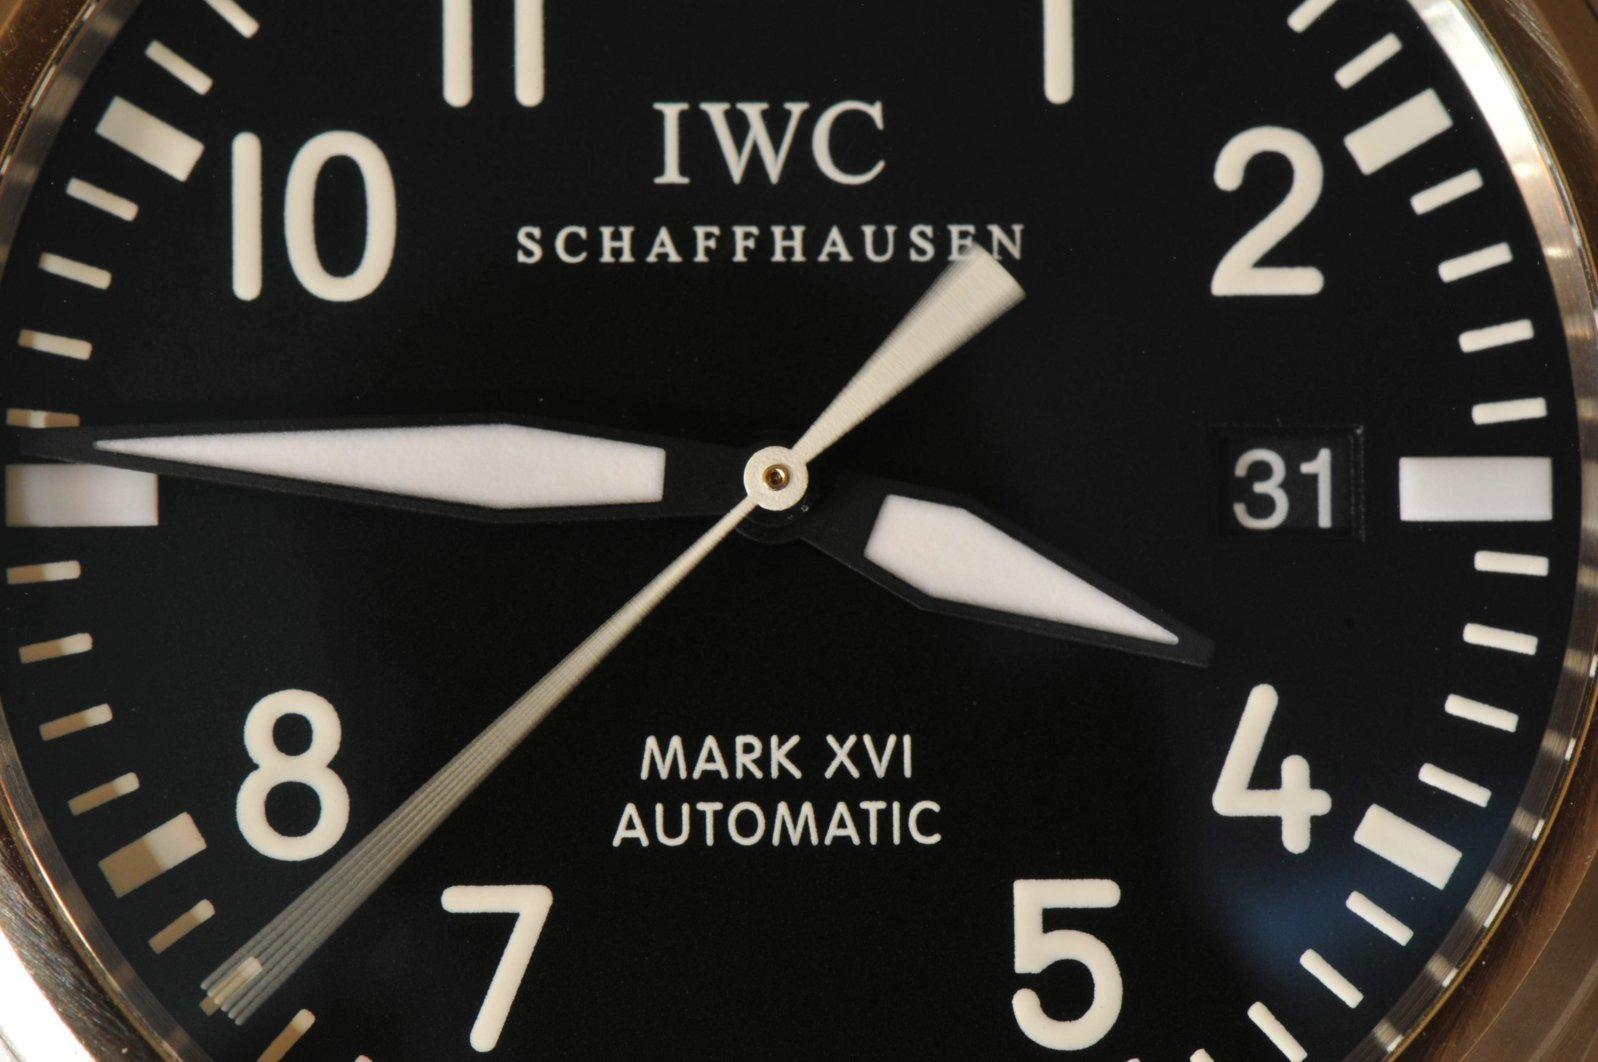 IWC M Macro 2-3.jpg